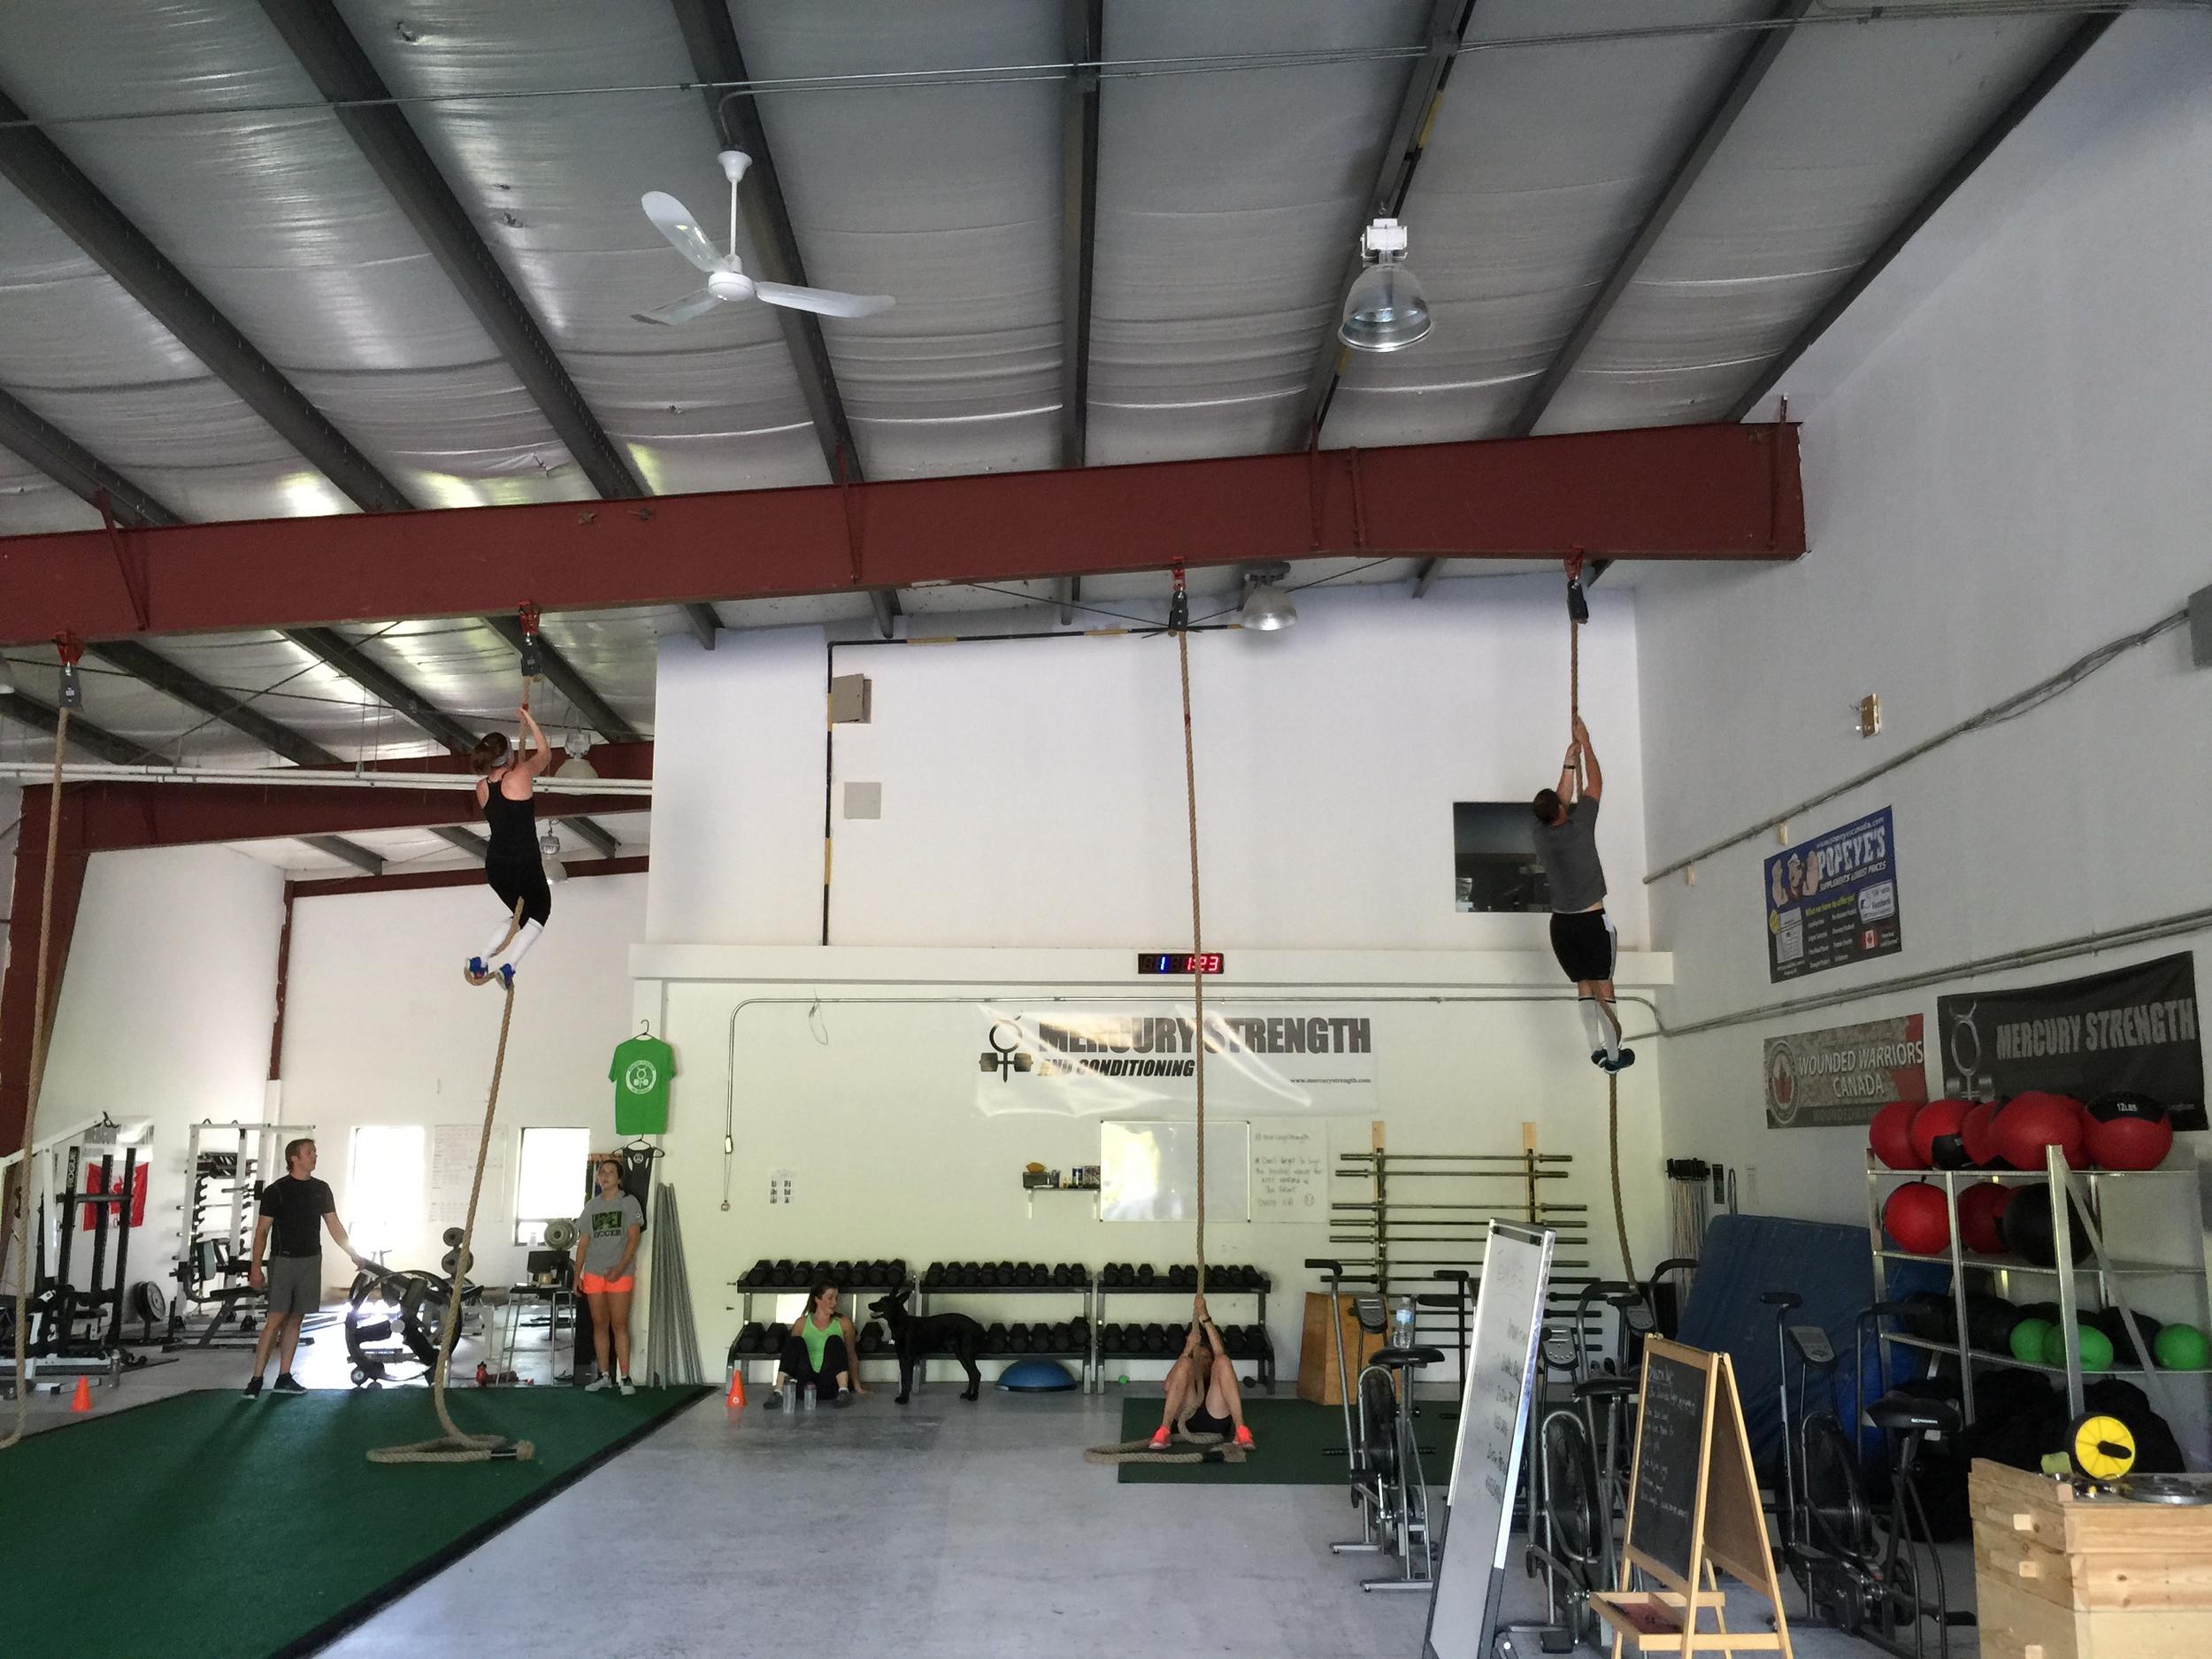 gym-fitness-training-bootcamp-kingston-rope climb